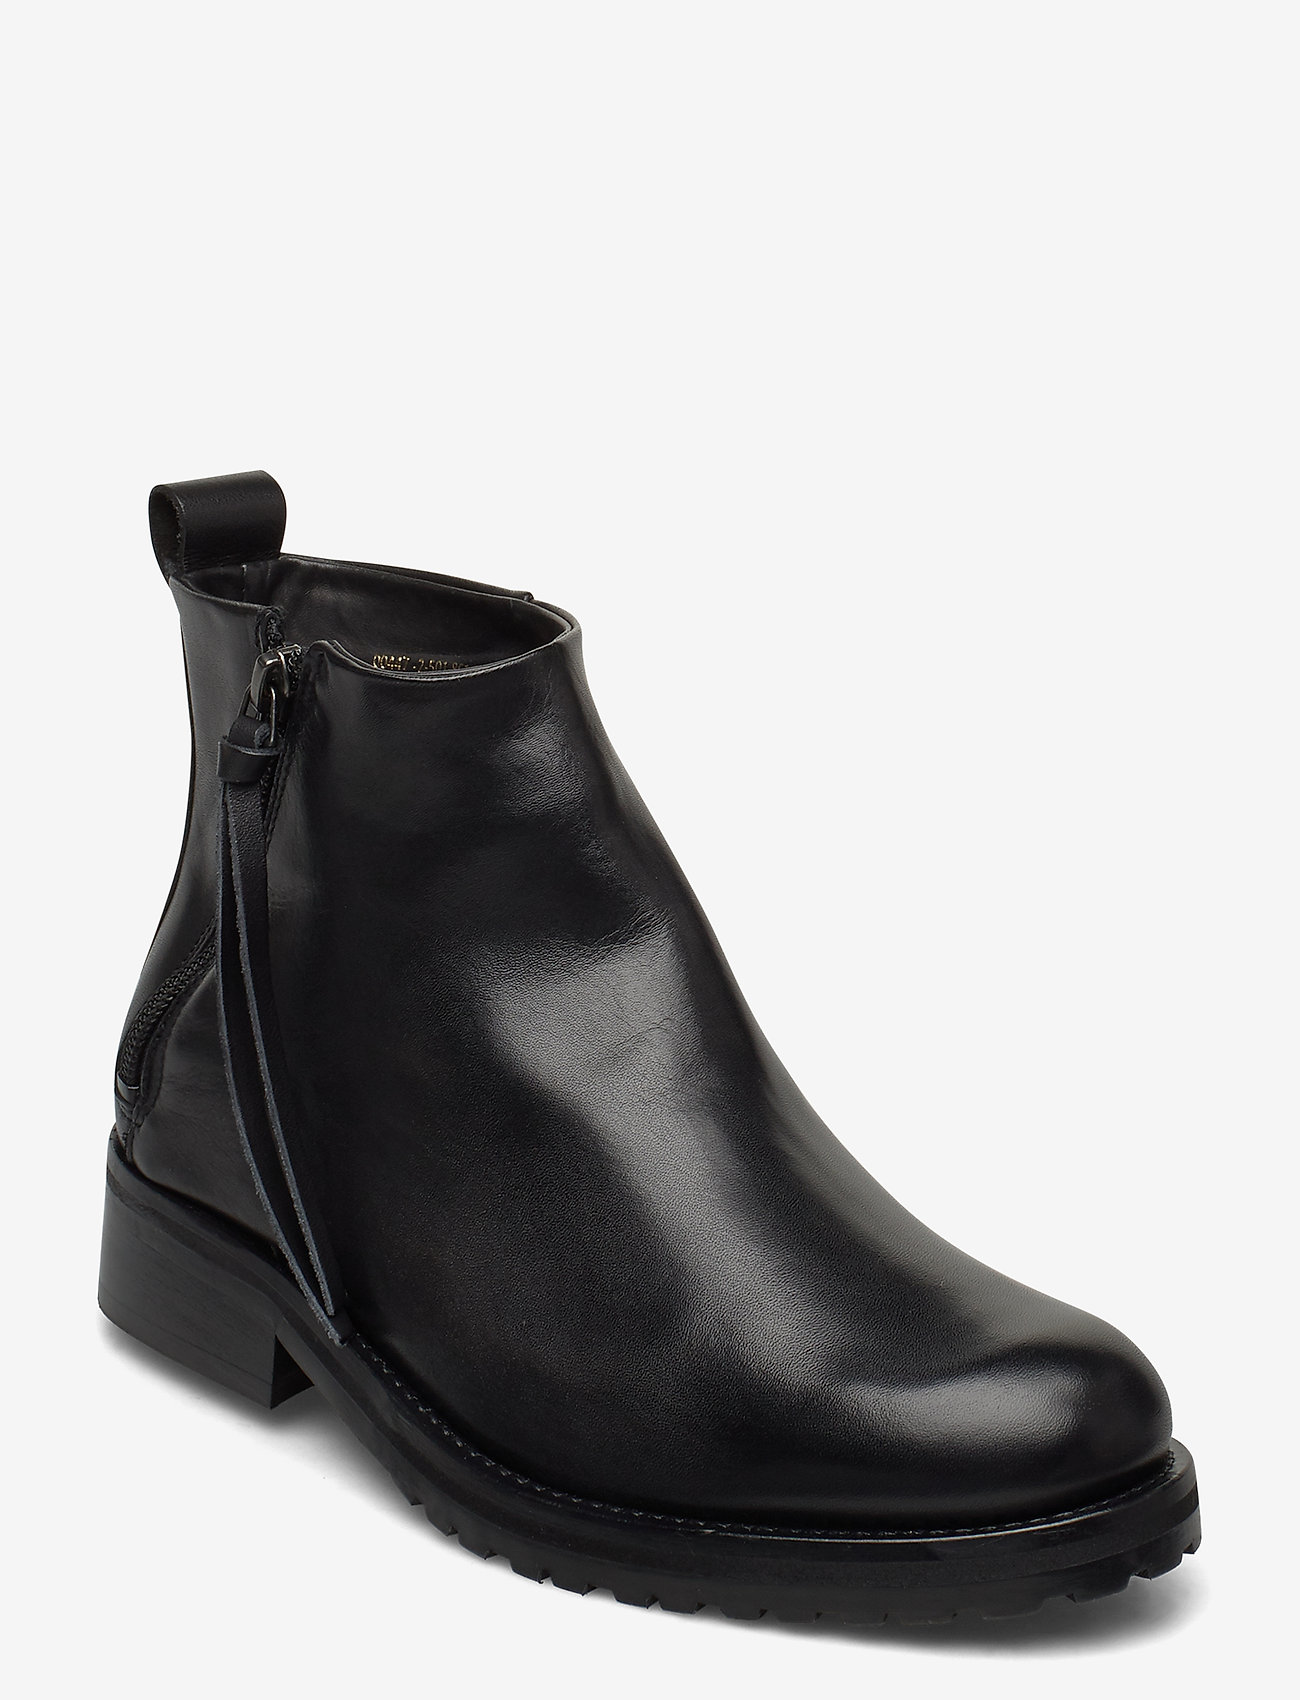 Royal RepubliQ - Ave Ankle Boot - Black - wysoki obcas - black - 0